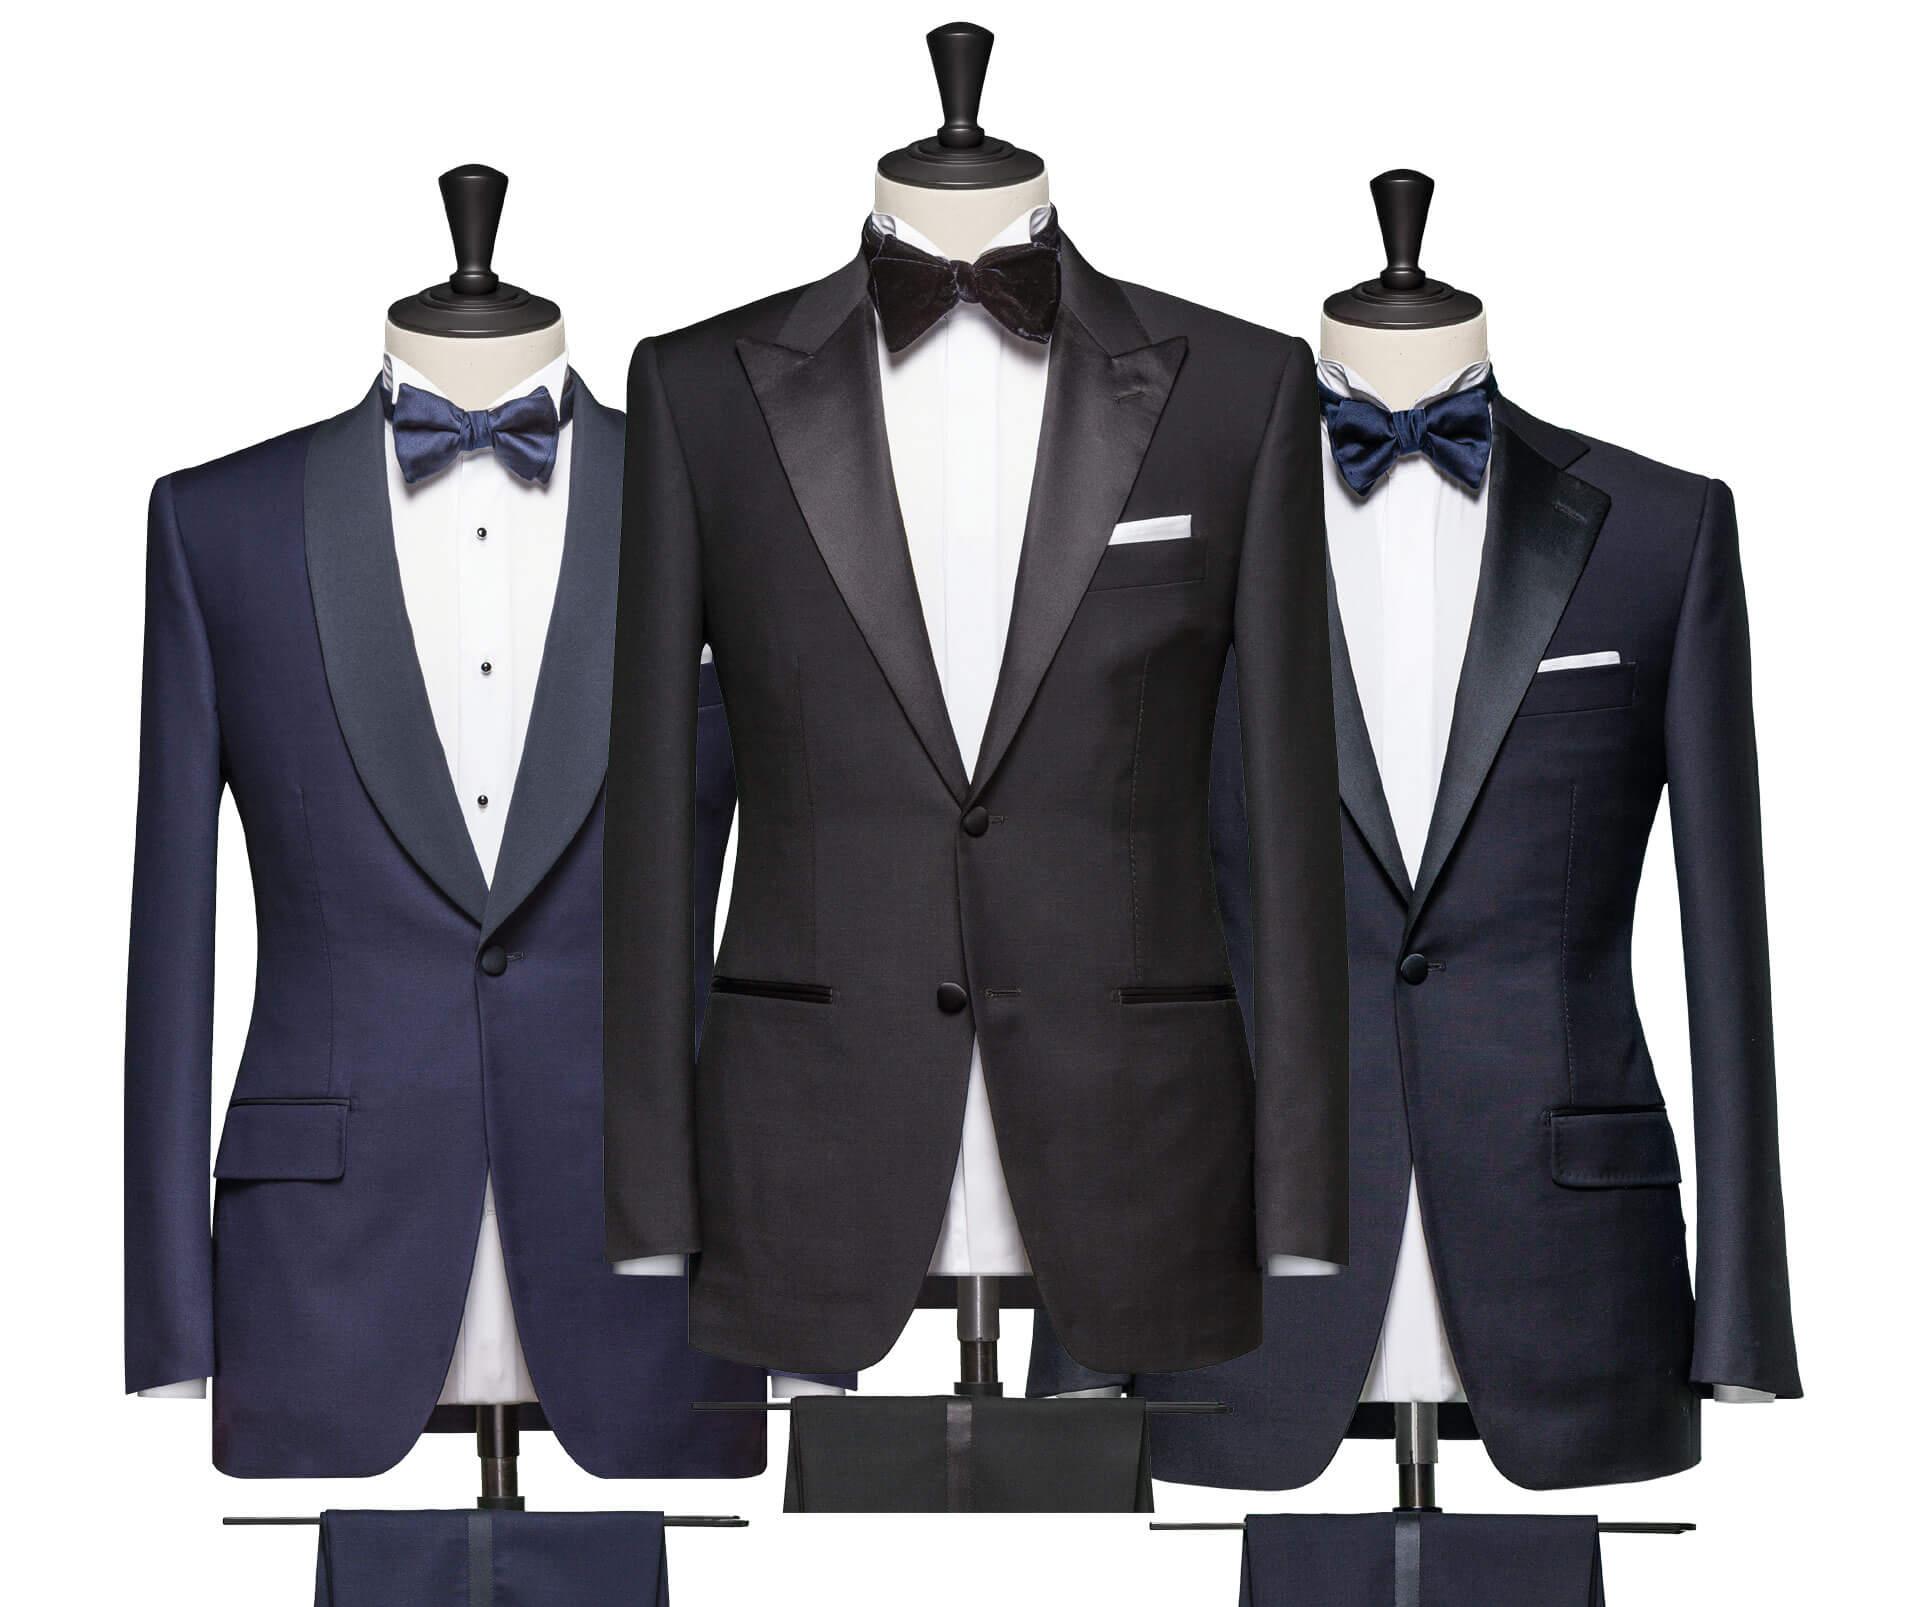 tuxedo Comple nam thời trang may đo Thomas Nguyen